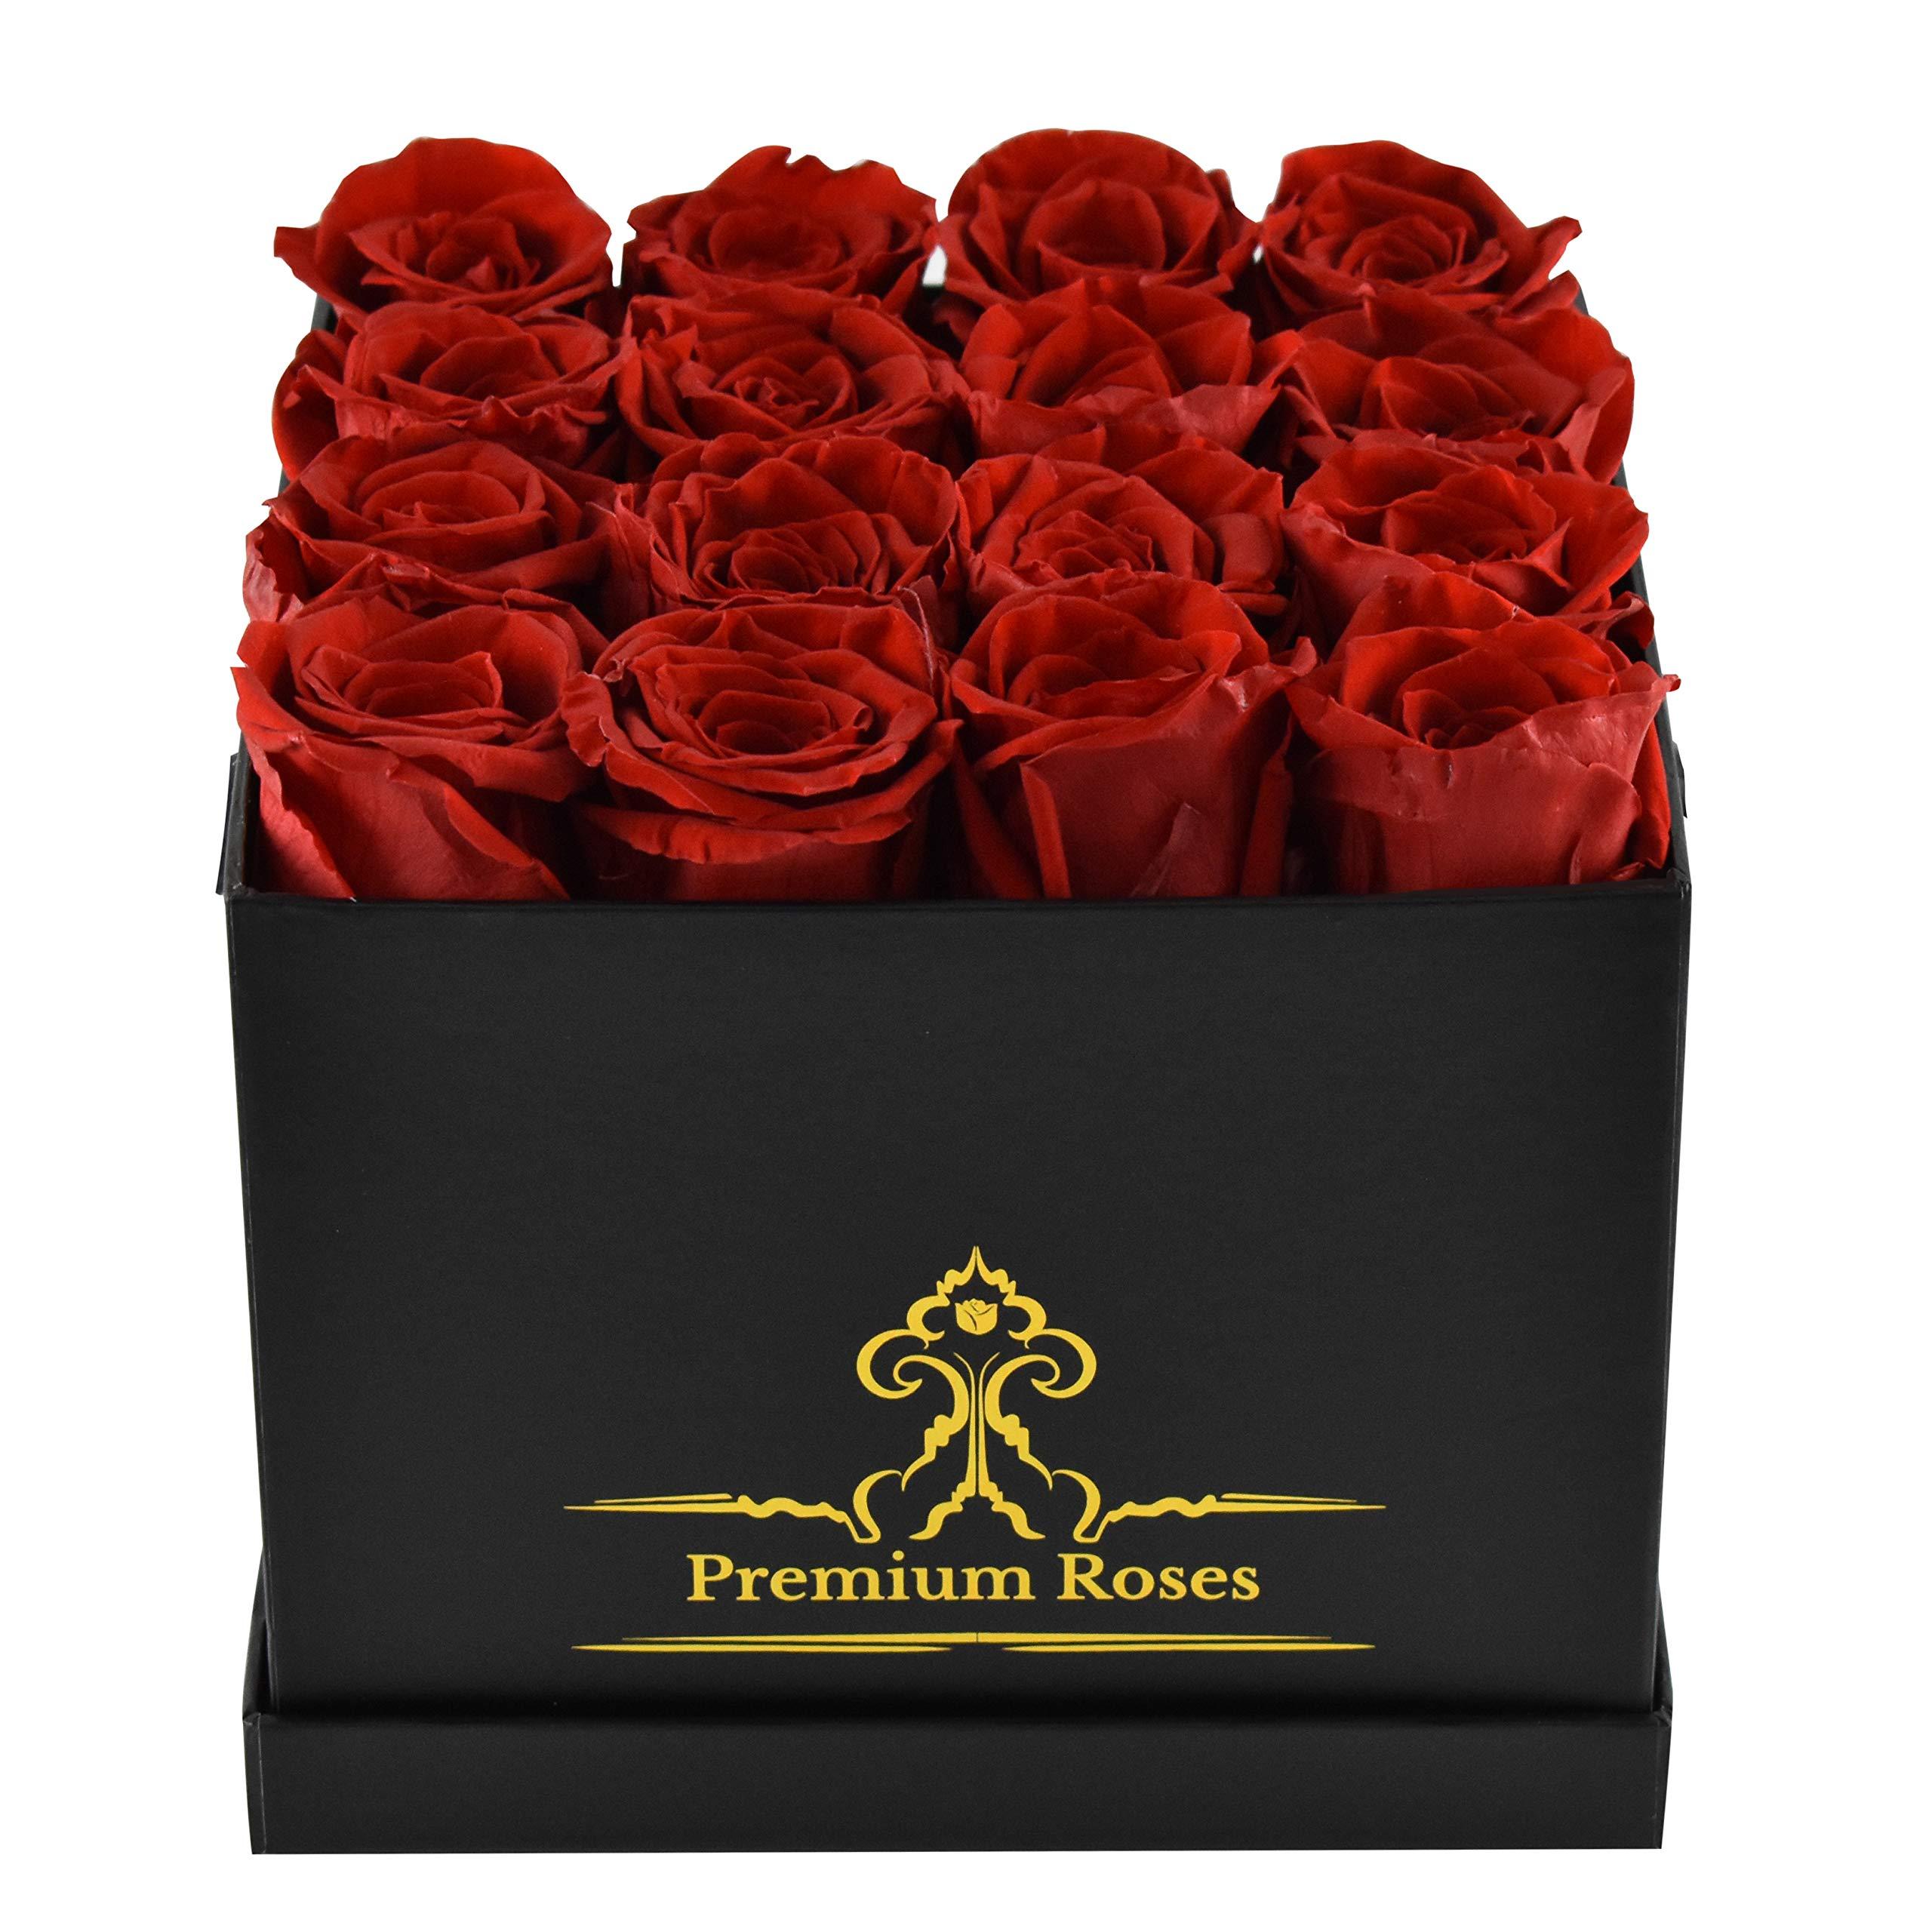 Premium Roses | Model Posh | Real Roses That Last 365 Days | Roses in a Box| Fresh Flowers (Black Box, Medium)